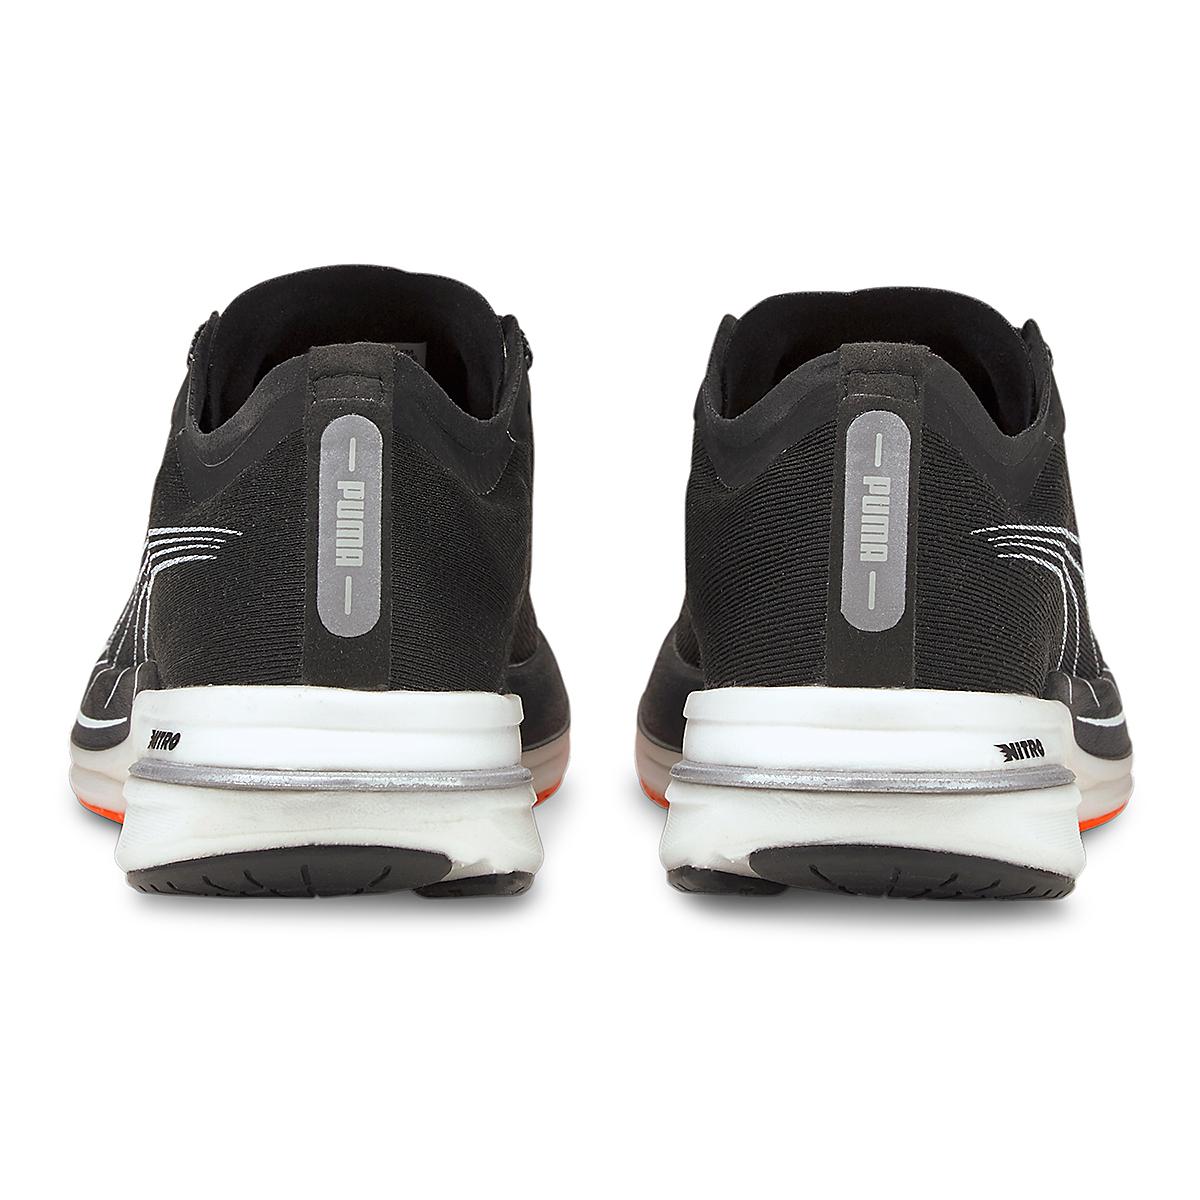 Women's Puma Deviate Nitro Running Shoe - Color: Puma Black-Lava Blast - Size: 5.5 - Width: Regular, Puma Black-Lava Blast, large, image 3